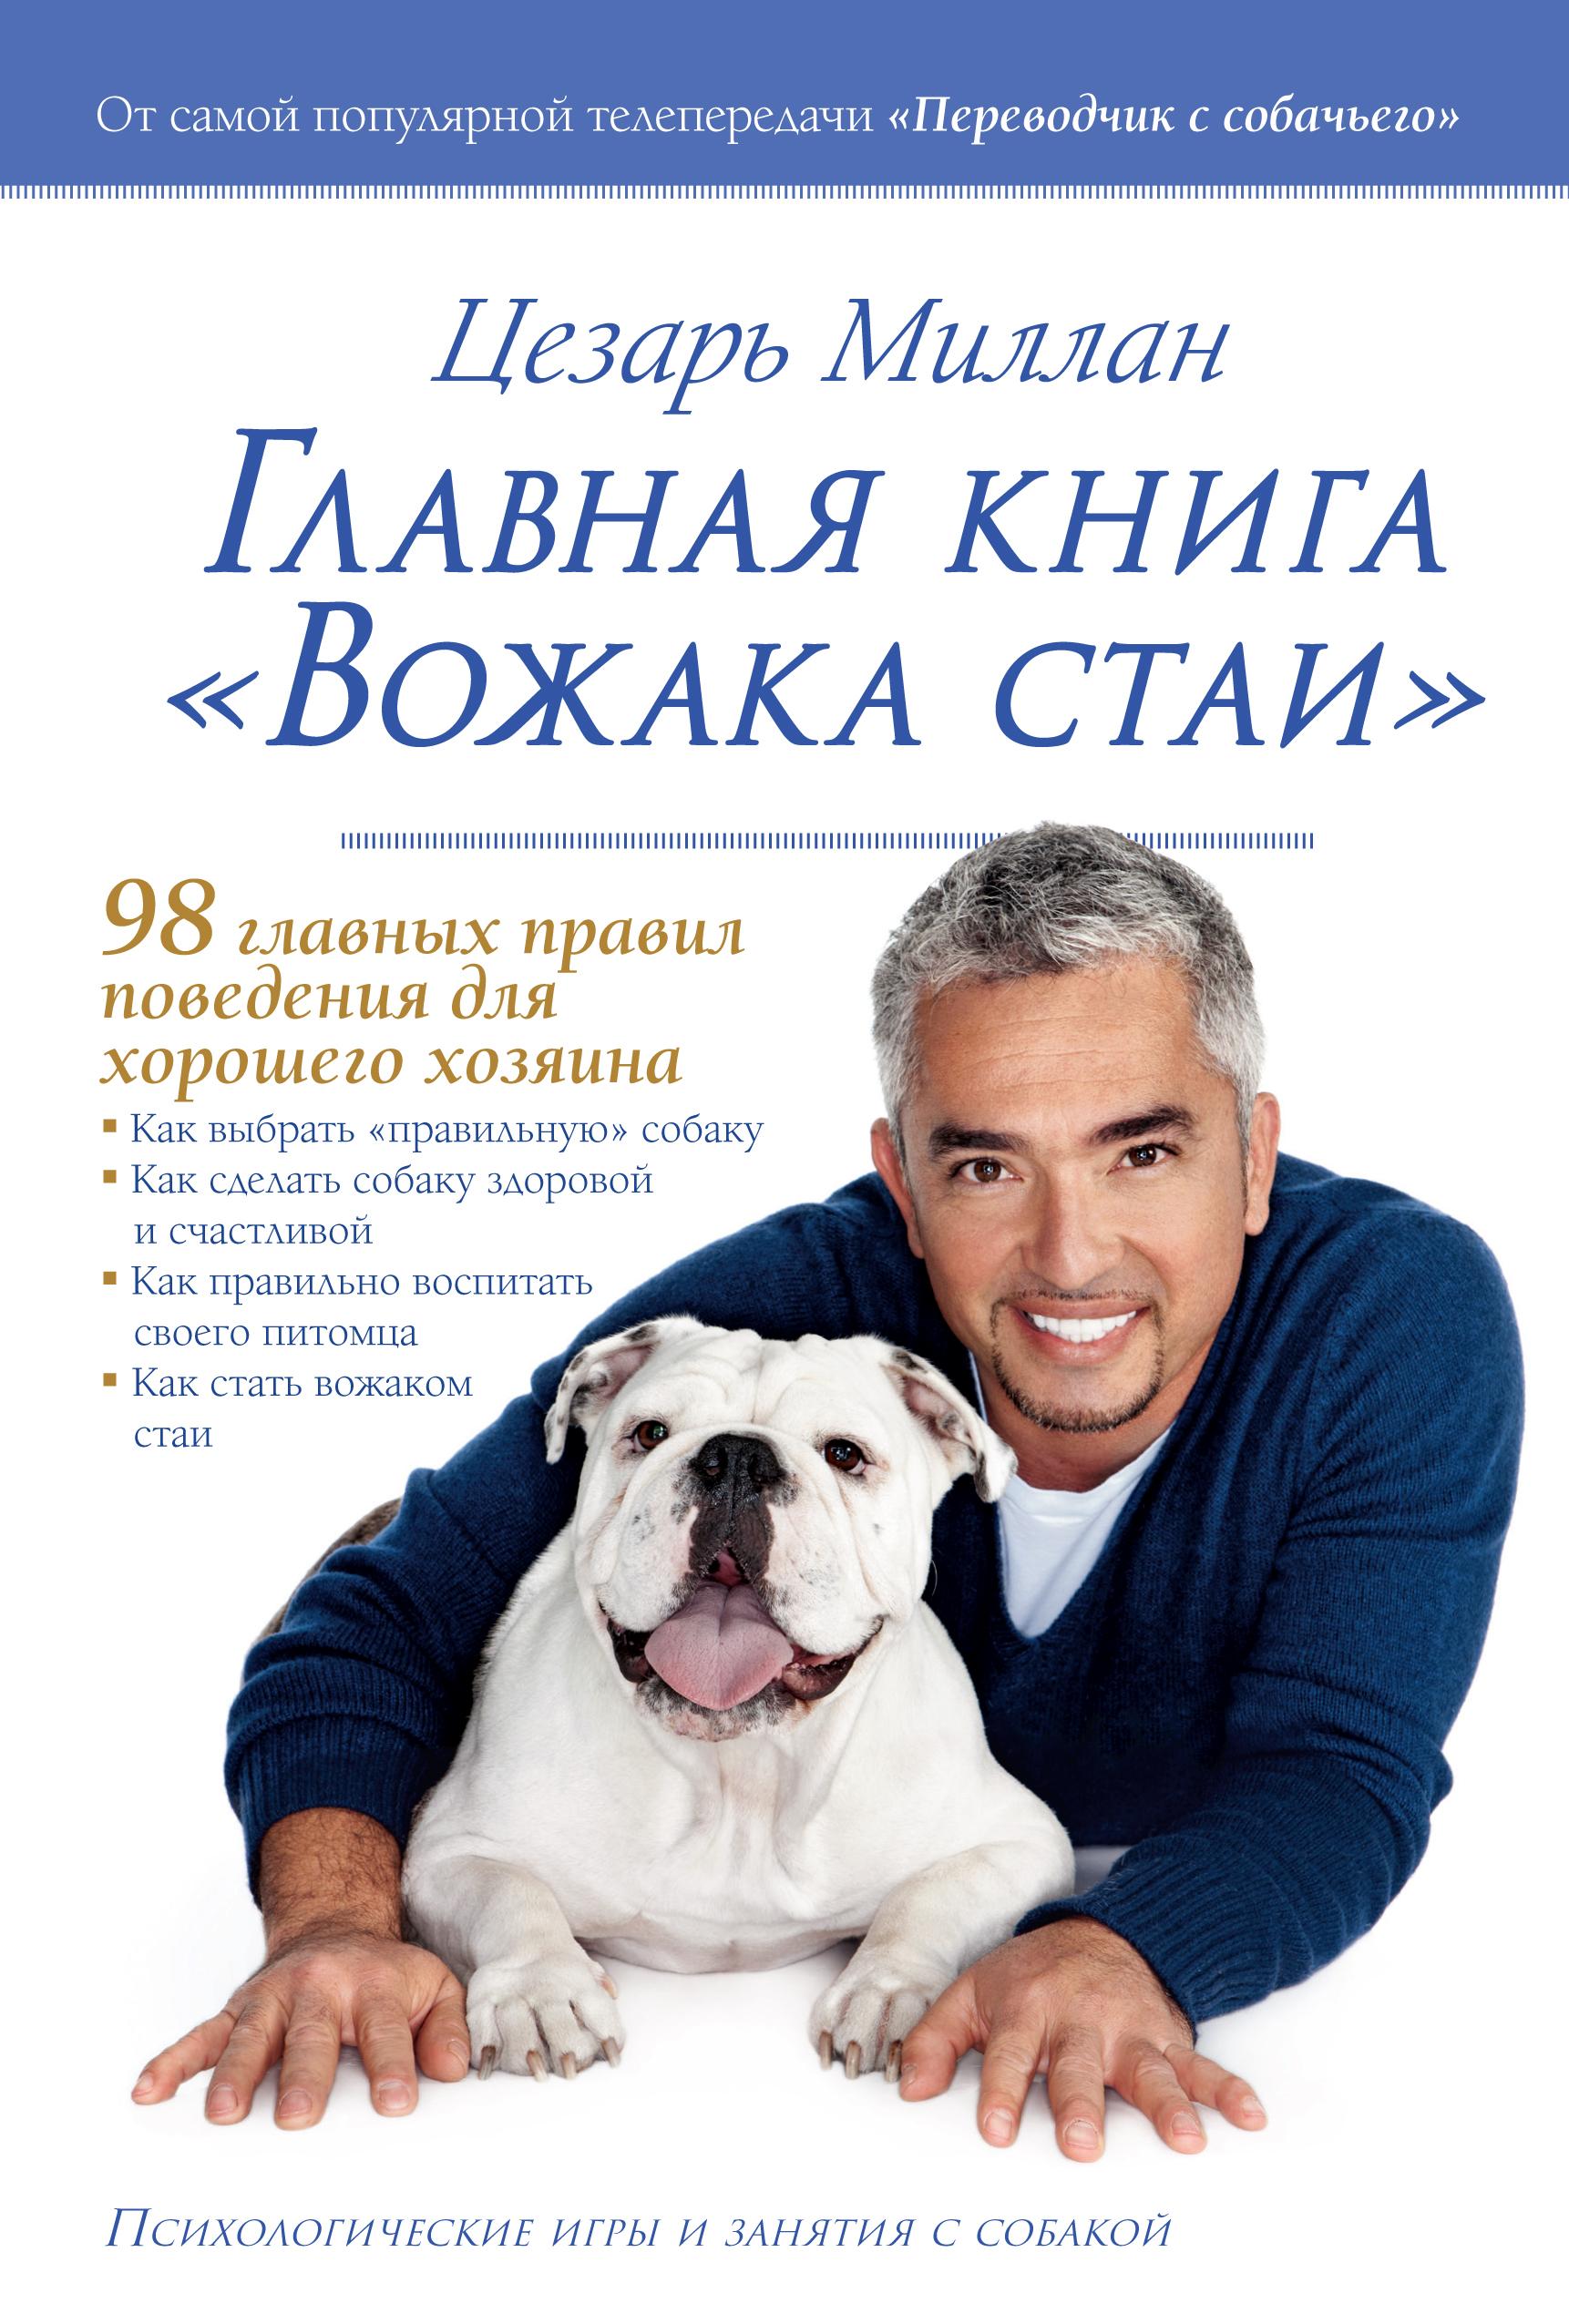 "Главная книга ""Вожака стаи"" ( Миллан Ц.  )"